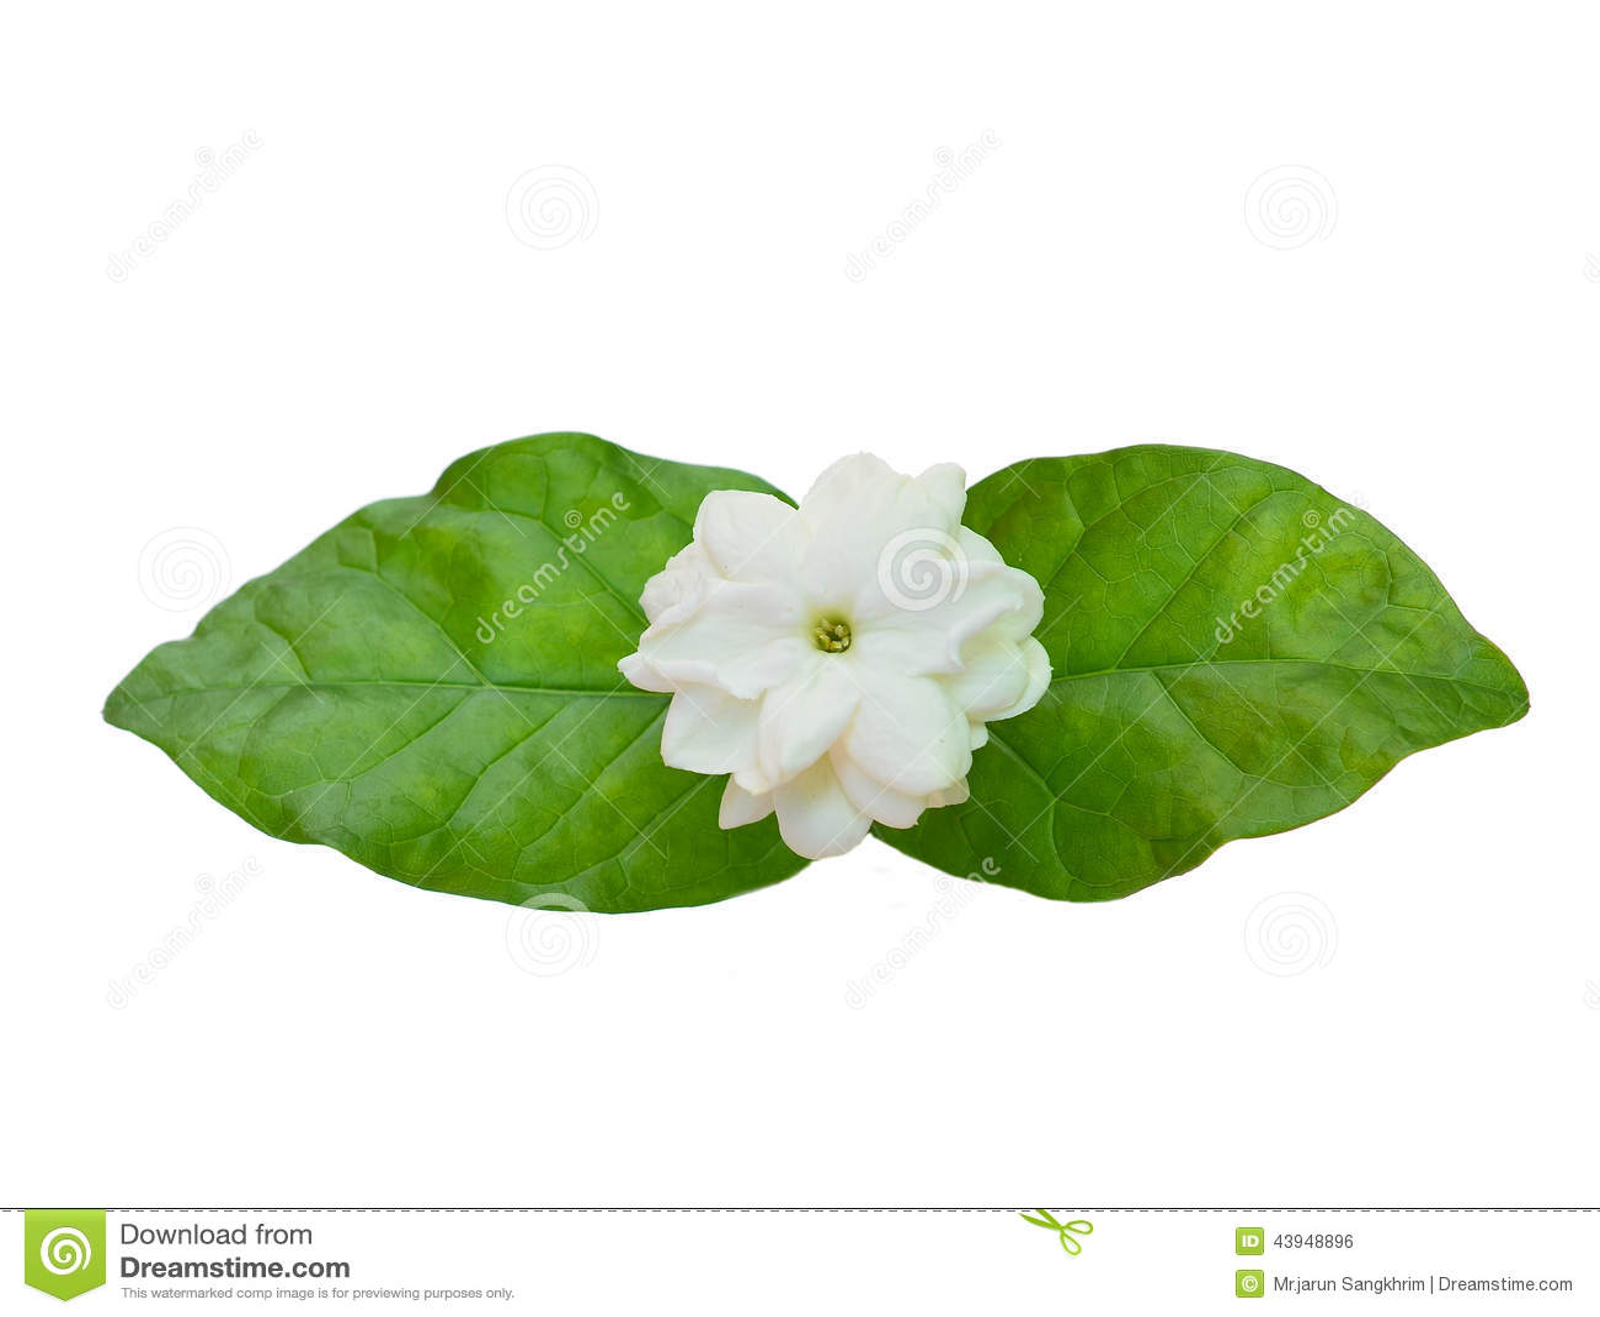 Jasmine flower with leaves stock photo image of faith 43948896 jasmine flower with leaves izmirmasajfo Gallery